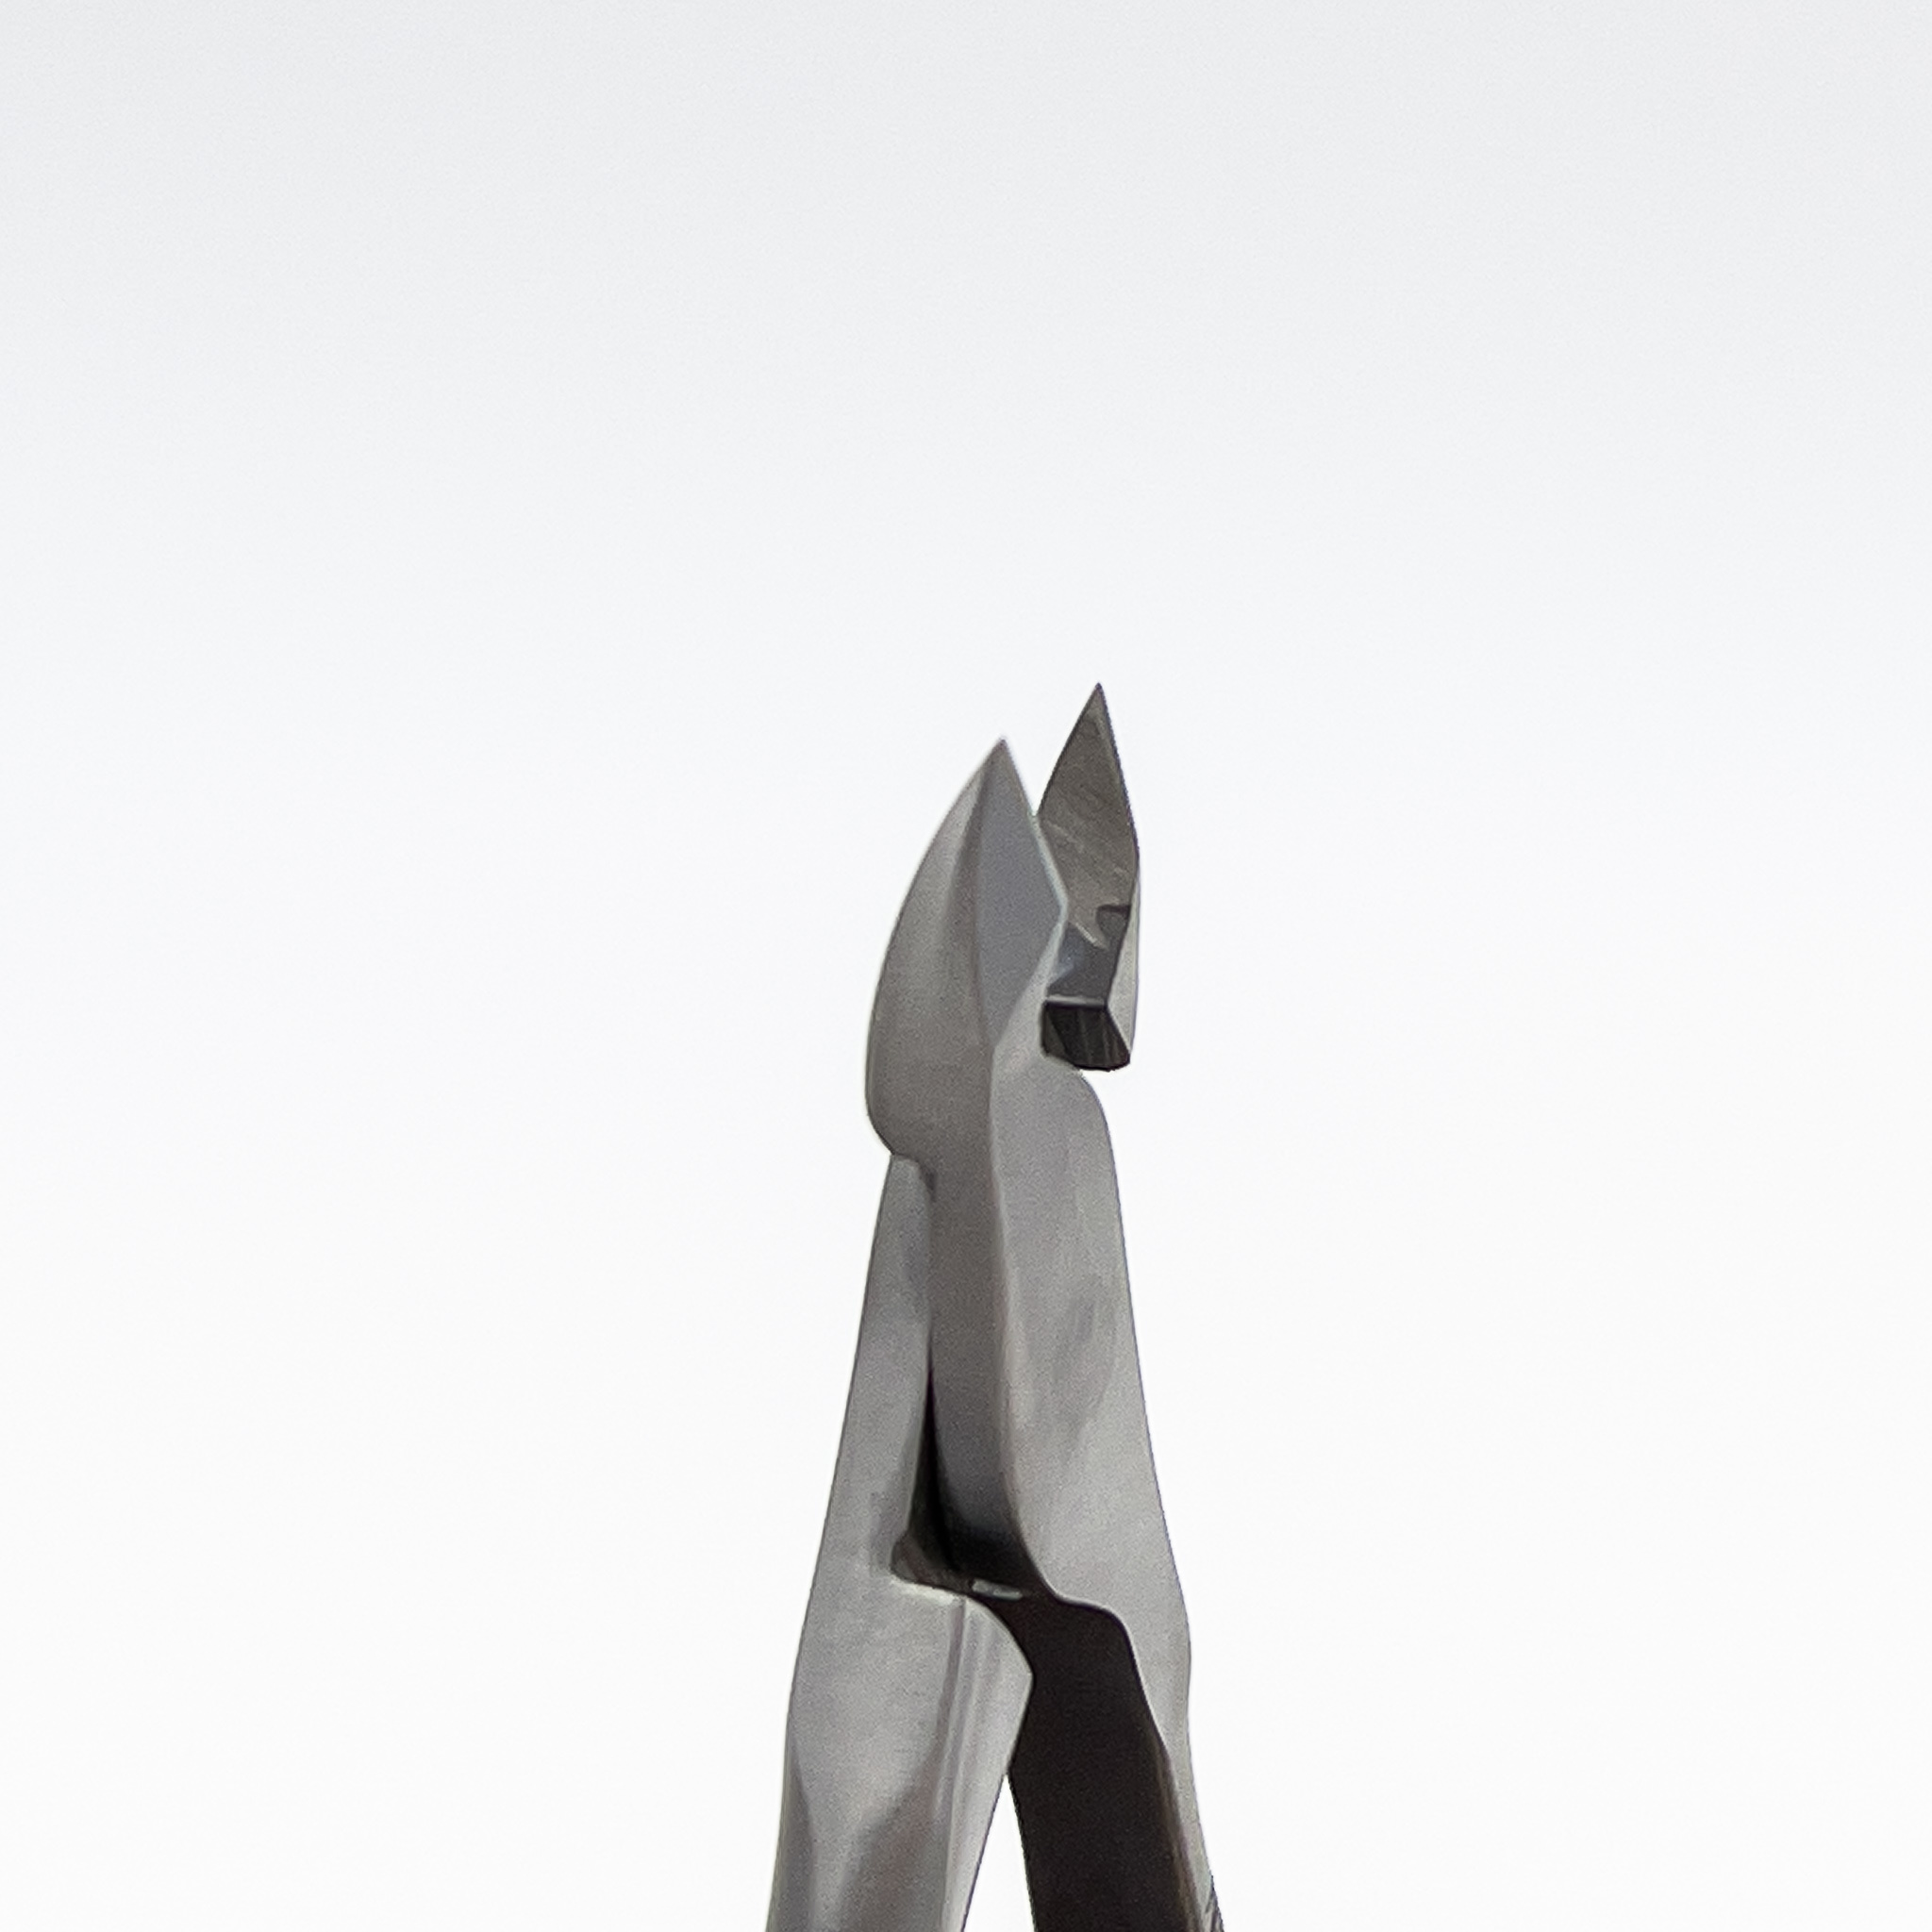 STALENA Pince à peau 5 mm - poignée courte KM-005 (N3-10-05)